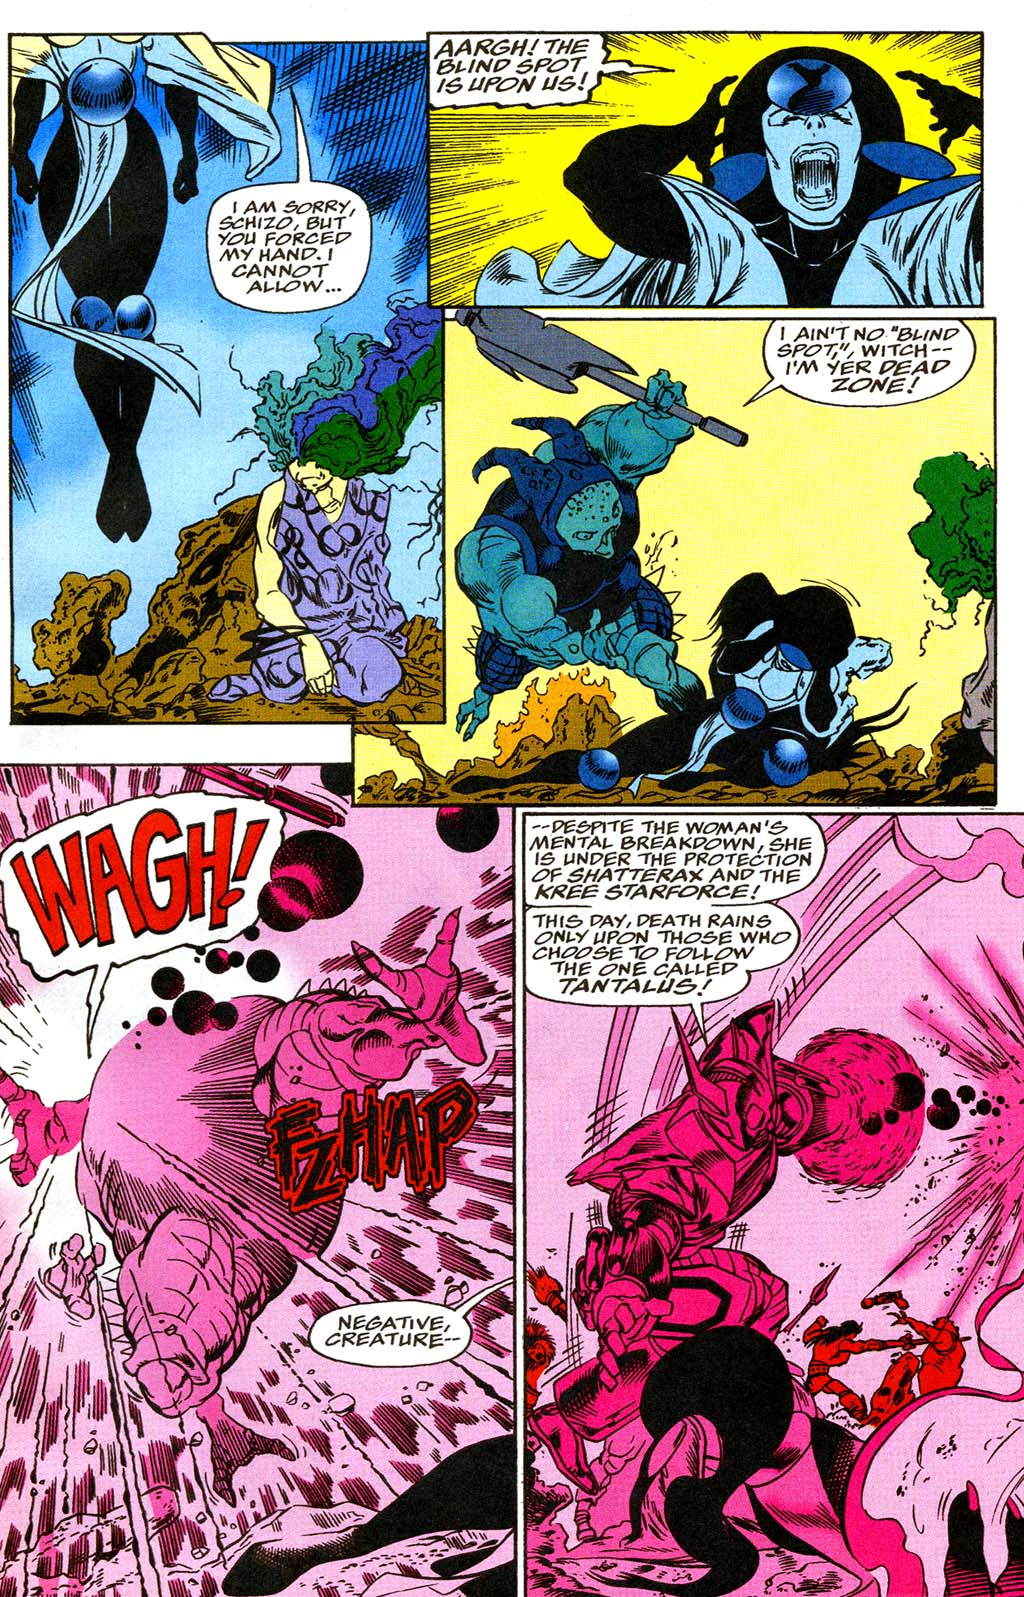 Read online Blackwulf comic -  Issue #8 - 18